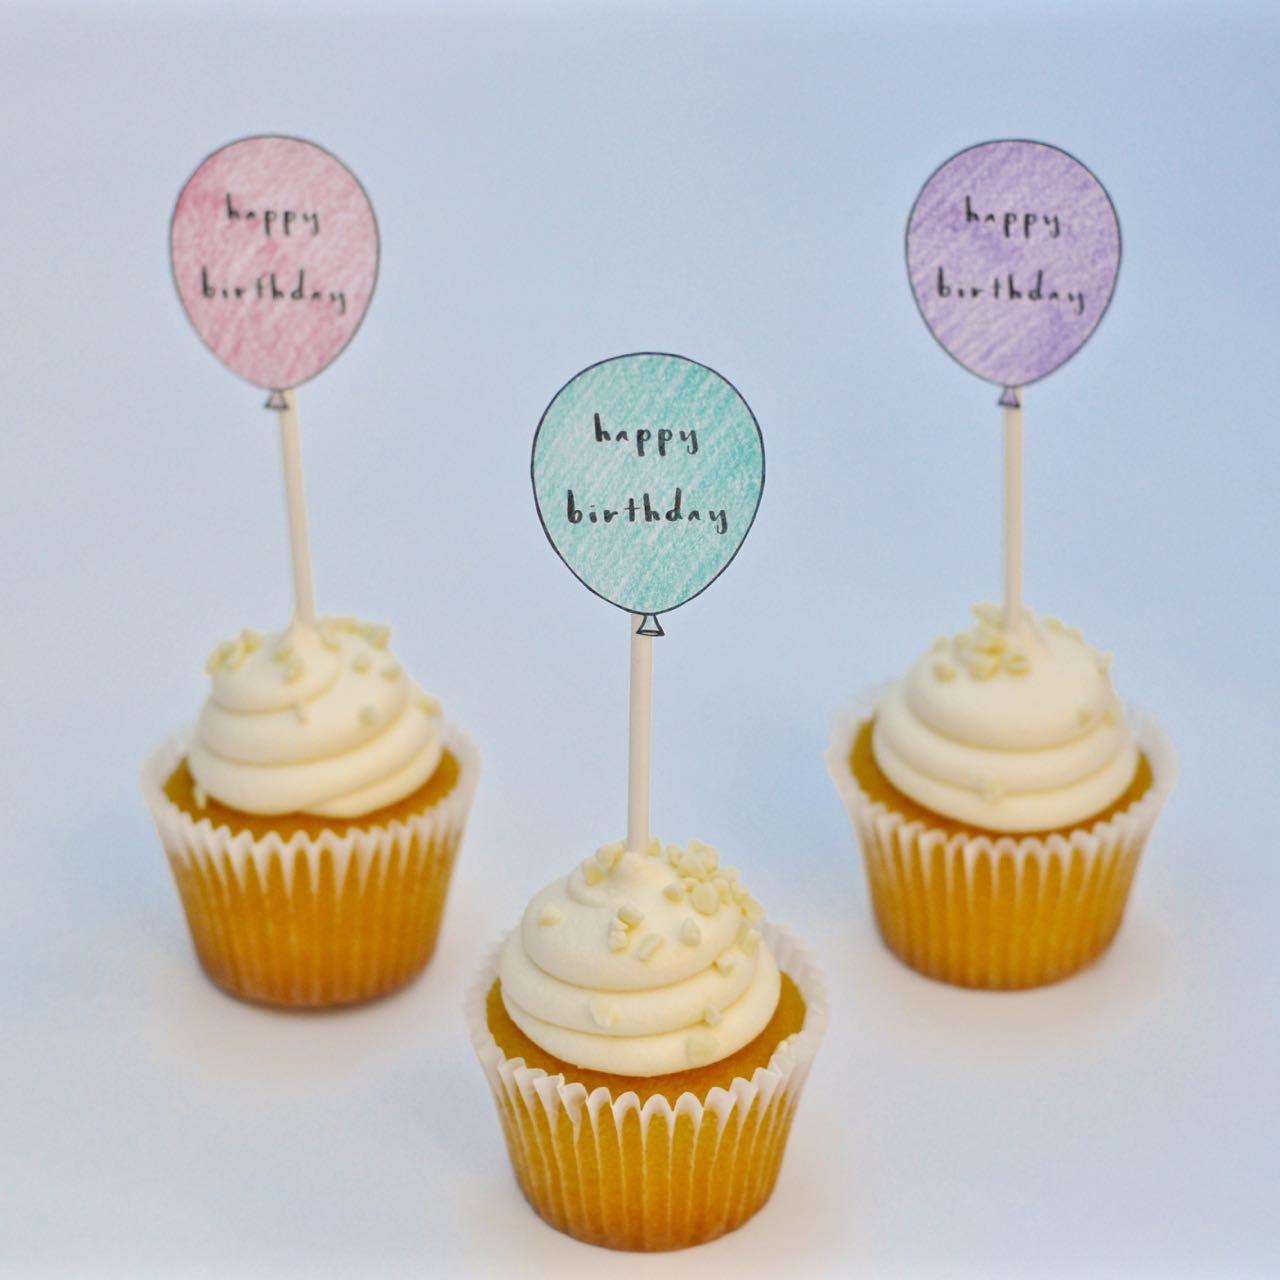 Free Printable Birthday Cupcake Toppers - Make Life Lovely - Free Printable Happy Birthday Cake Topper